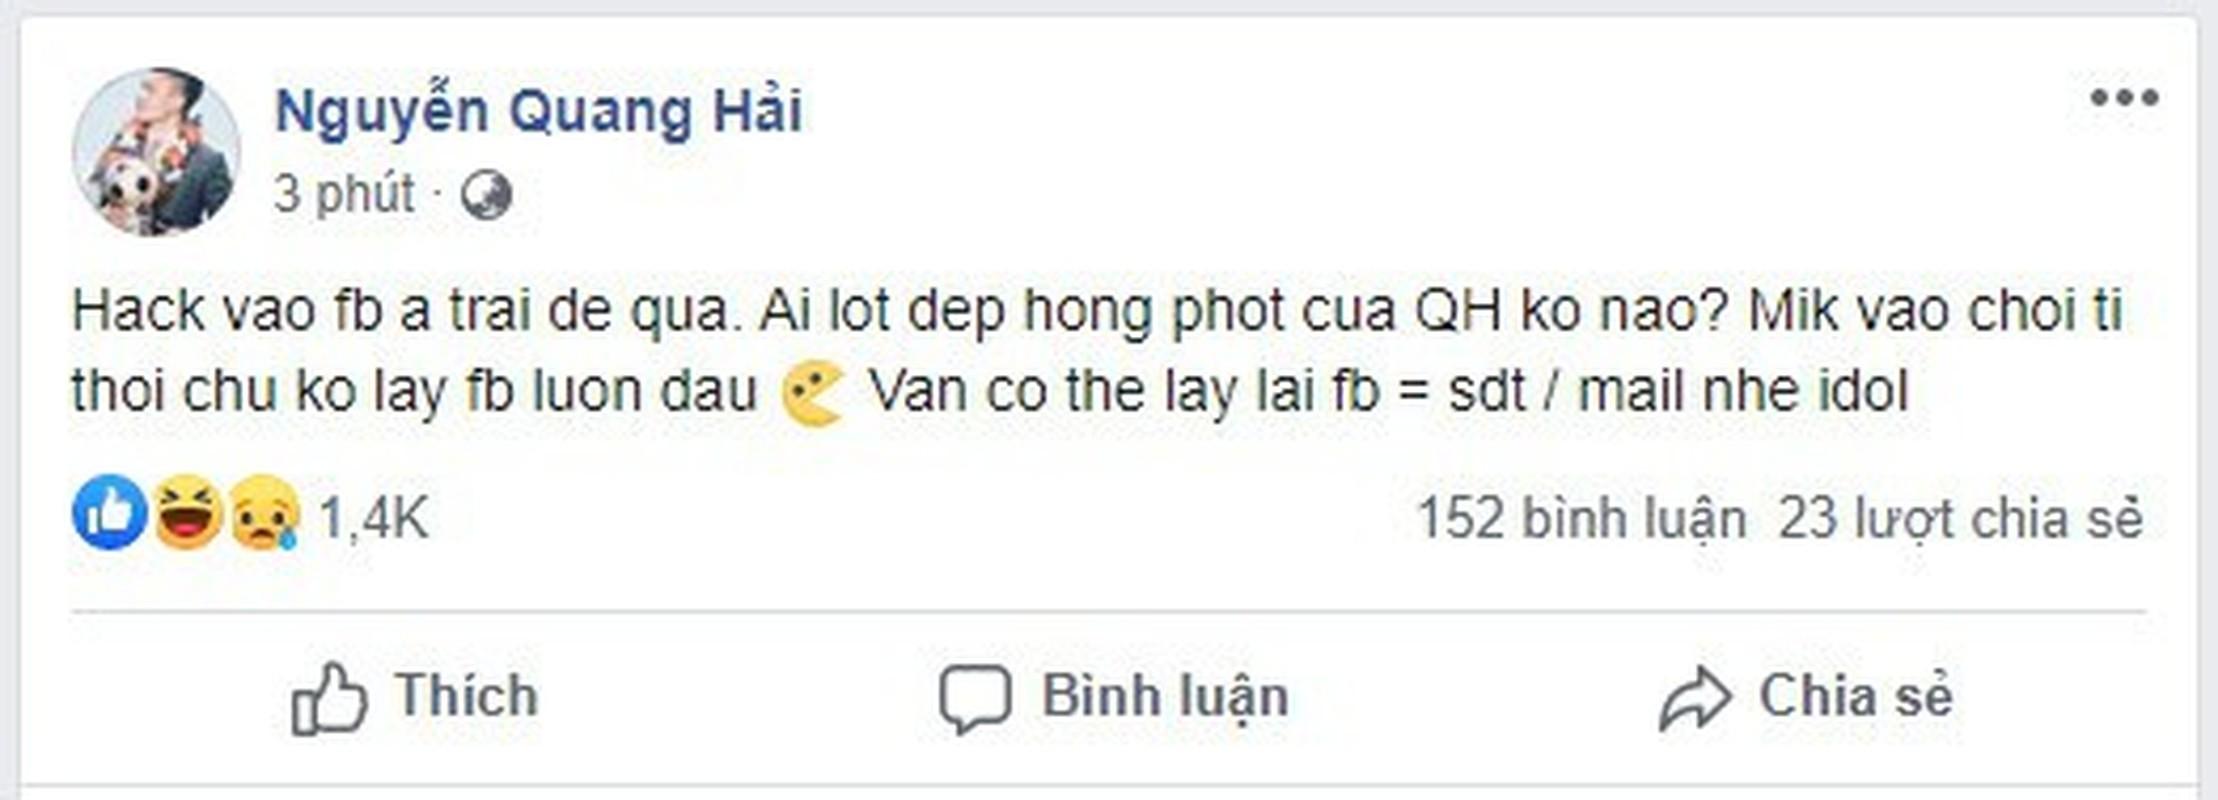 Quang Hai lo tin nhan nhay cam, ban gai co dong thai bat ngo